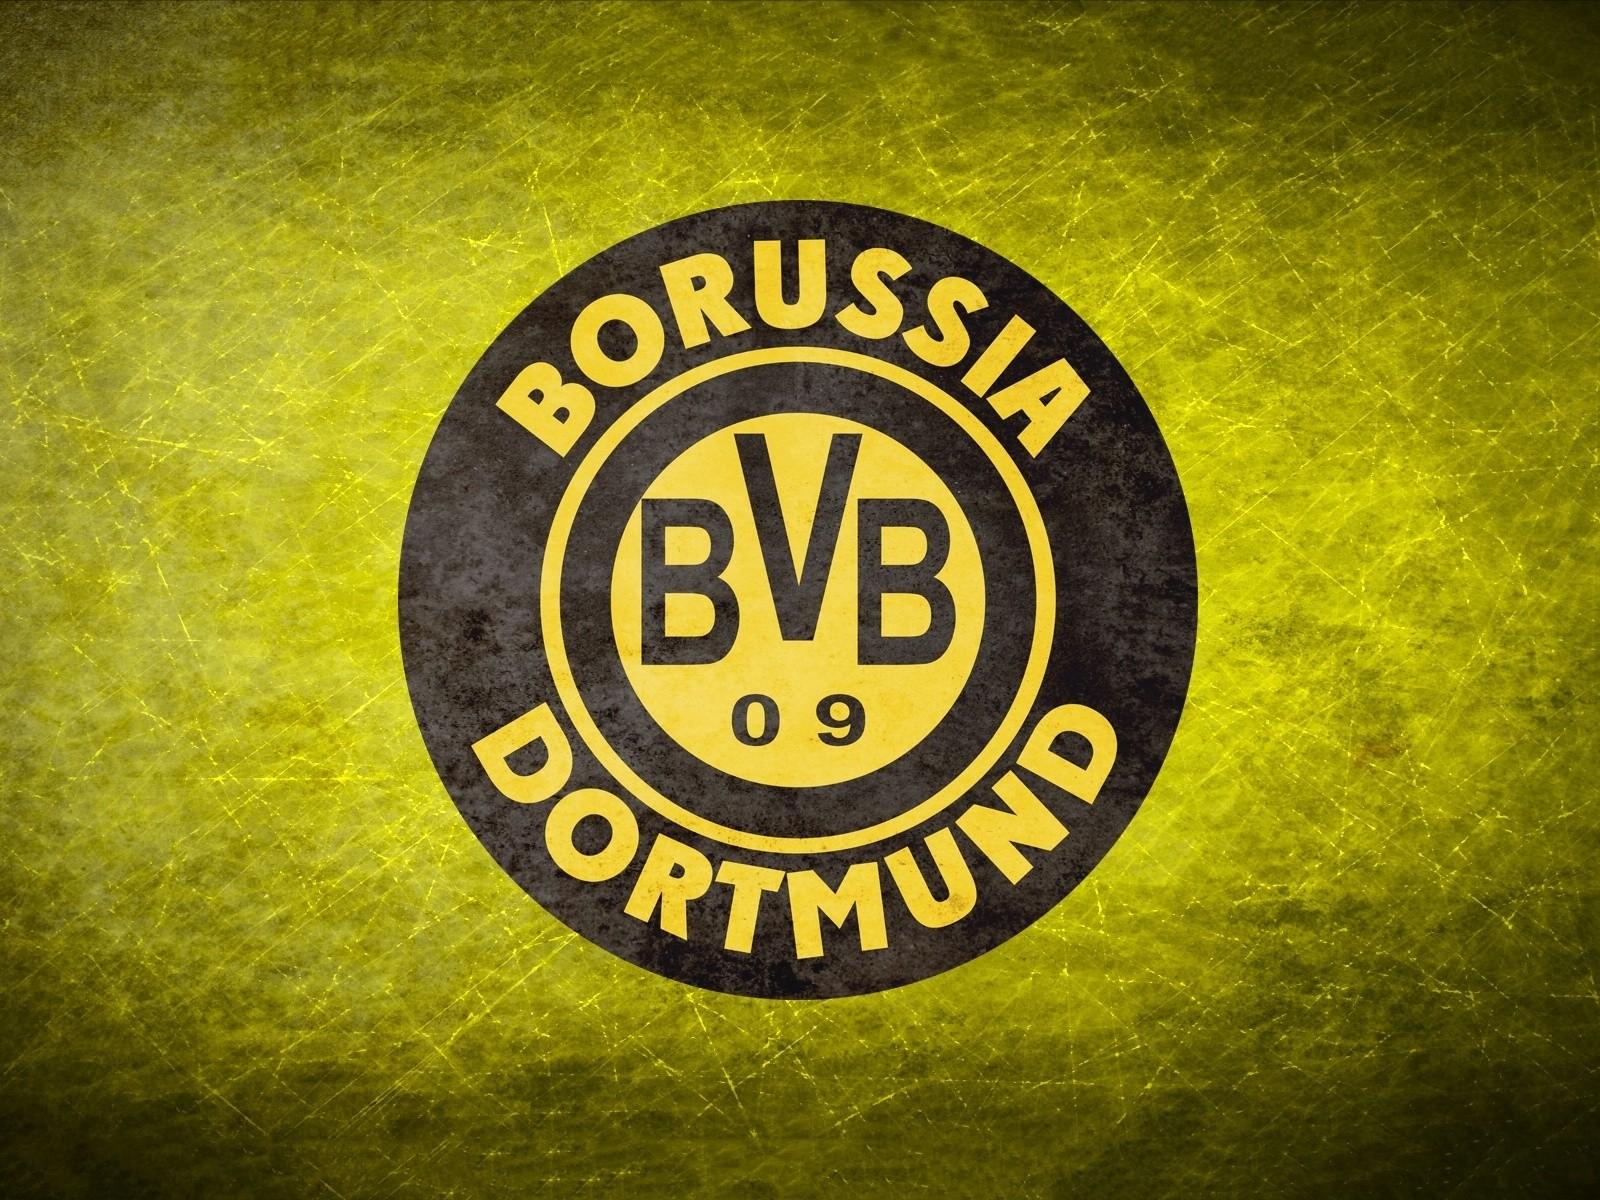 borussia-dortmund-bvb-logo-1600x1200